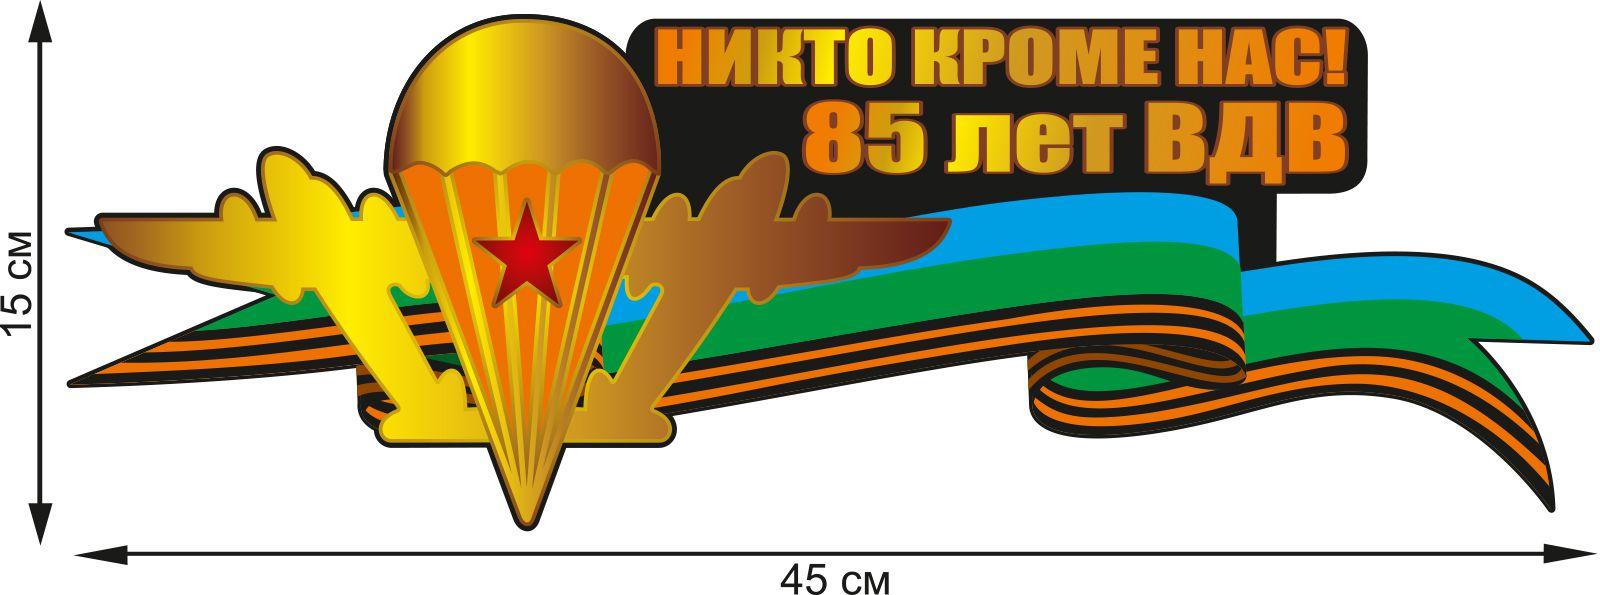 Праздничная наклейка на авто с девизов ВДВ